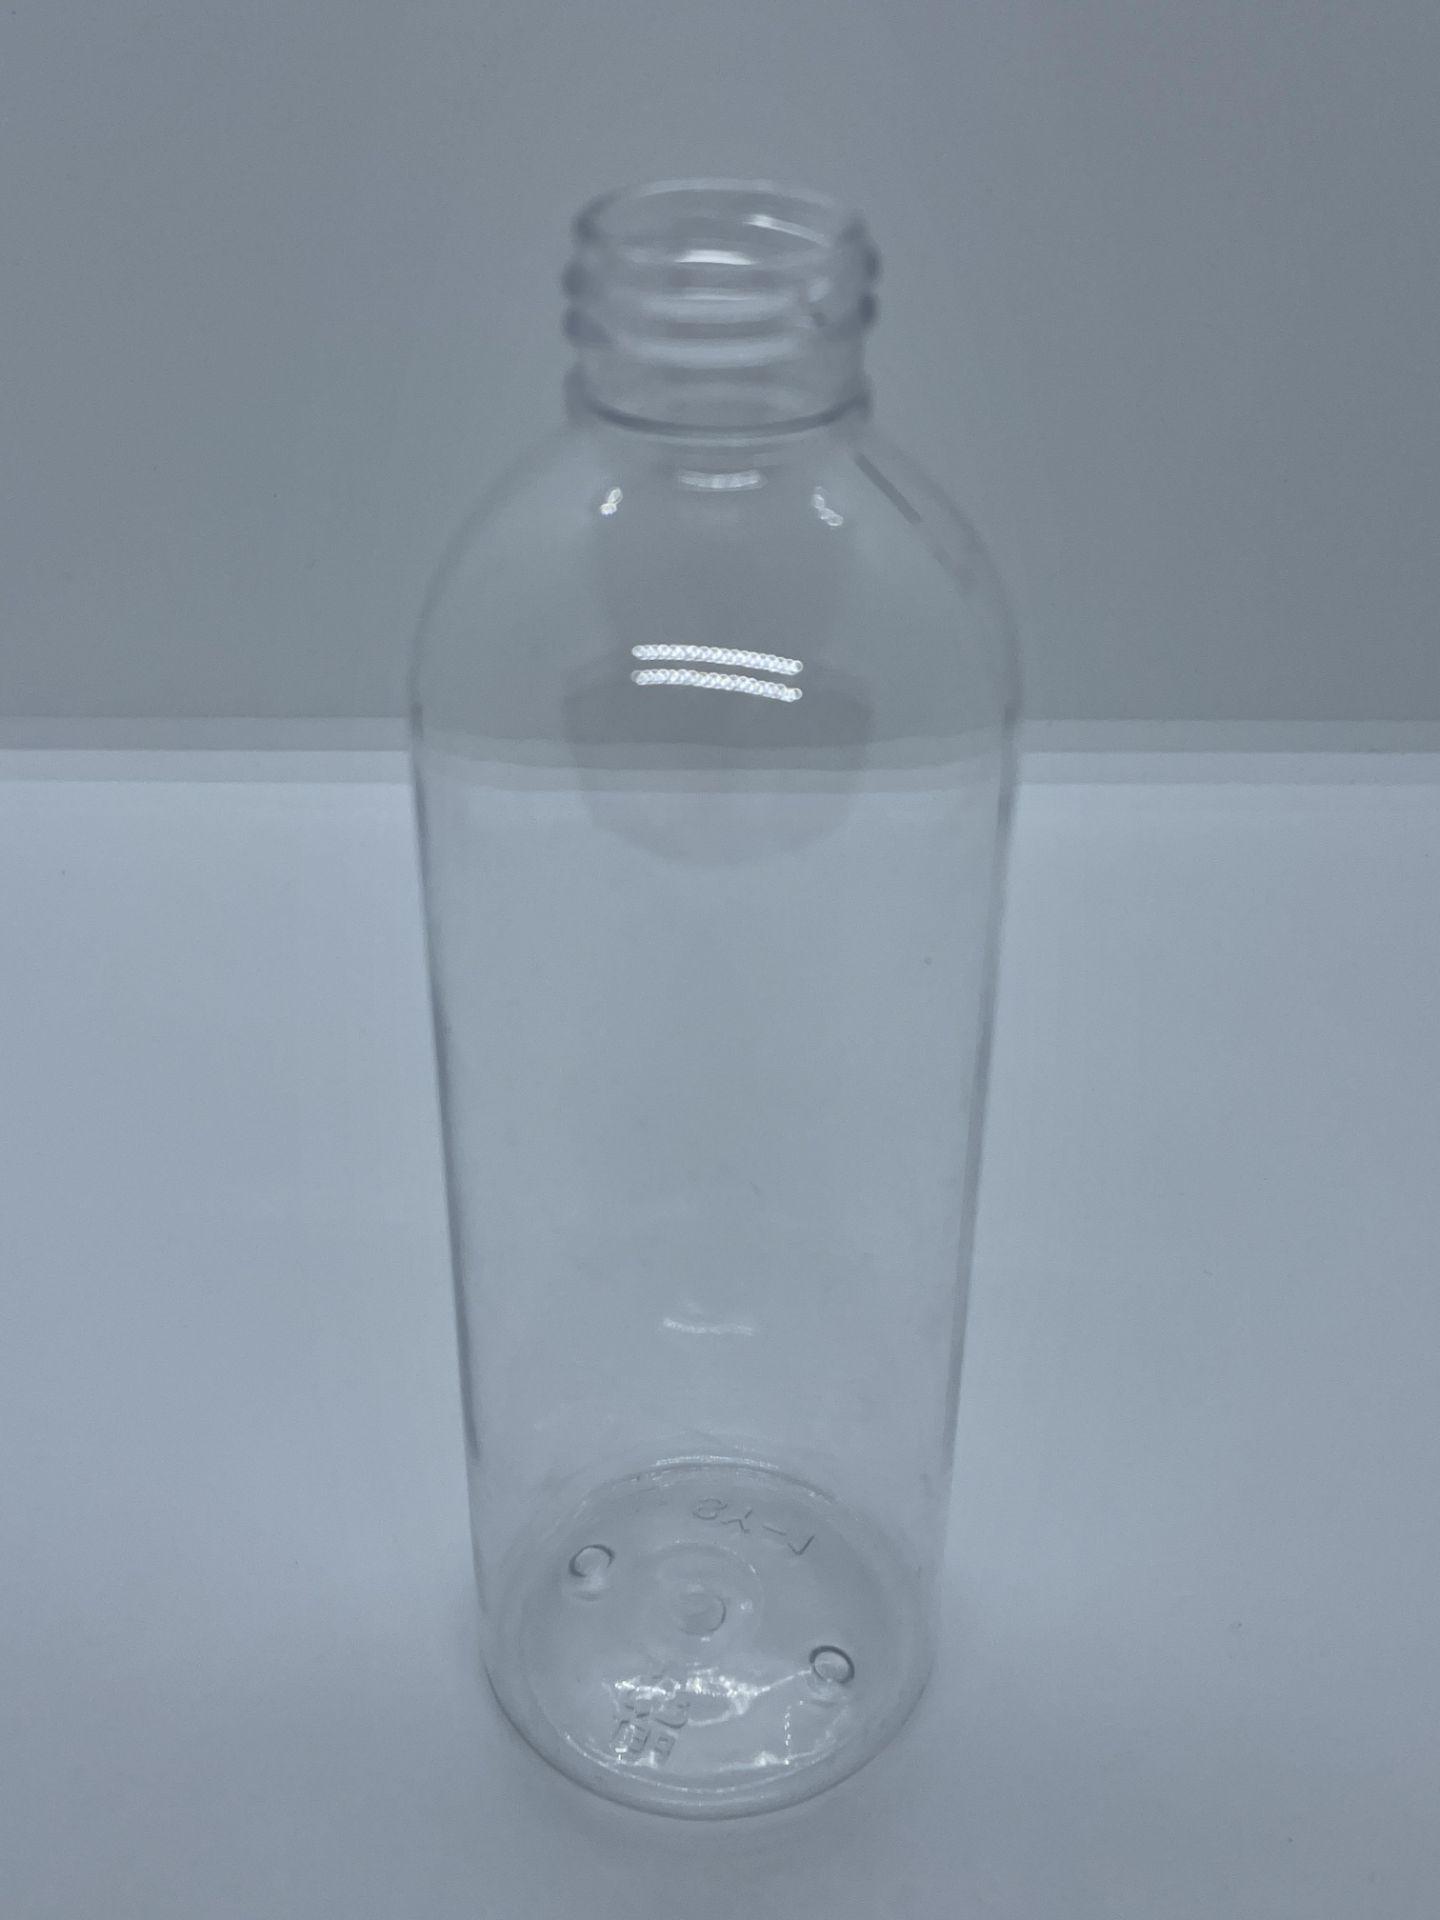 "75,000 - Clear Plastic Bullet 8 oz Empty Bottles, 24-410 Threading Neck, 6.25"" Tall, 2"" Diameter - Image 2 of 5"